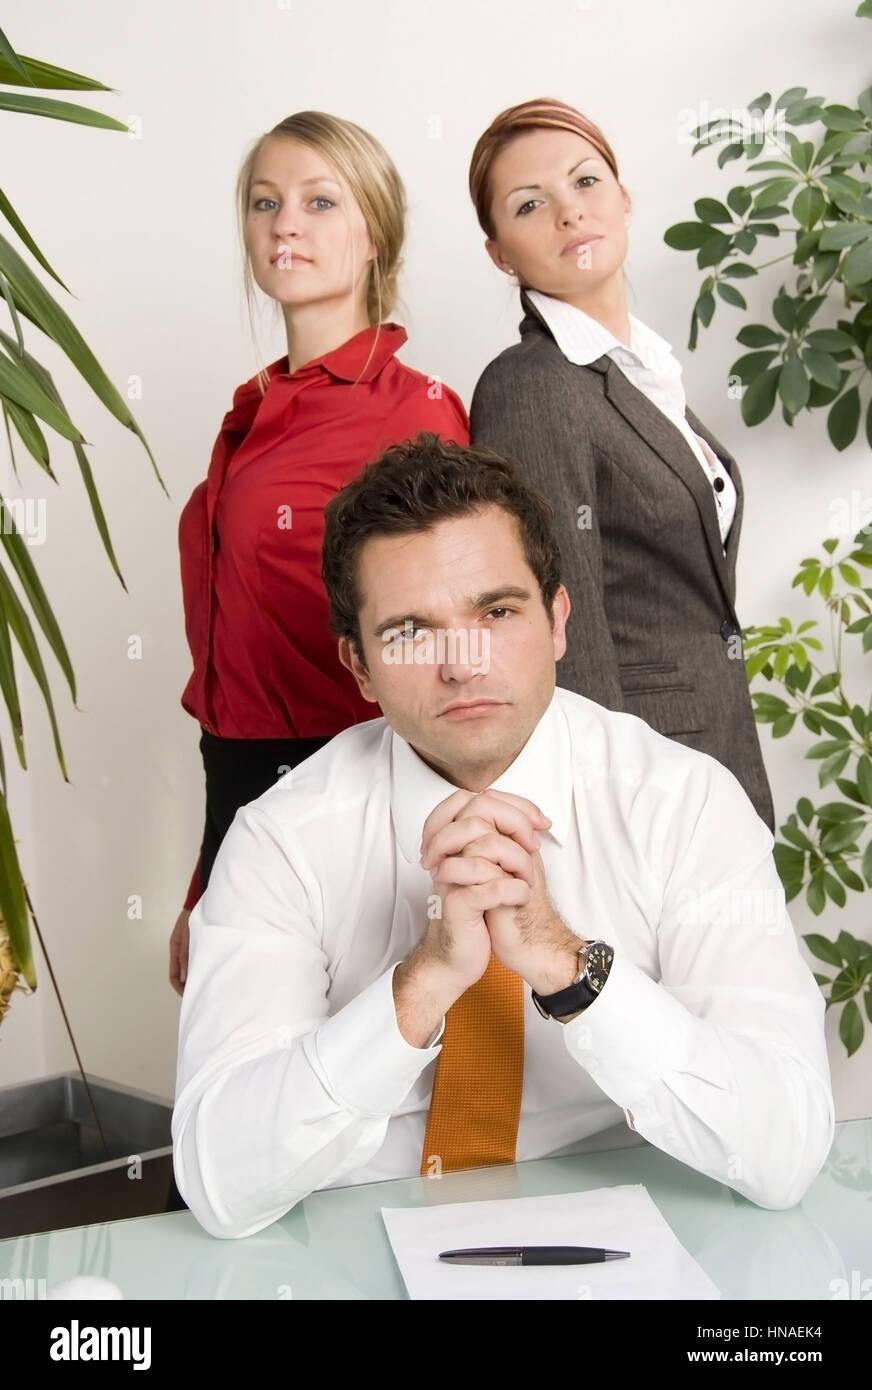 Junger geschaeftsmann mit zwei huebschen Sekretaerinnen - young business man with two attractive secretaries Stock Photo